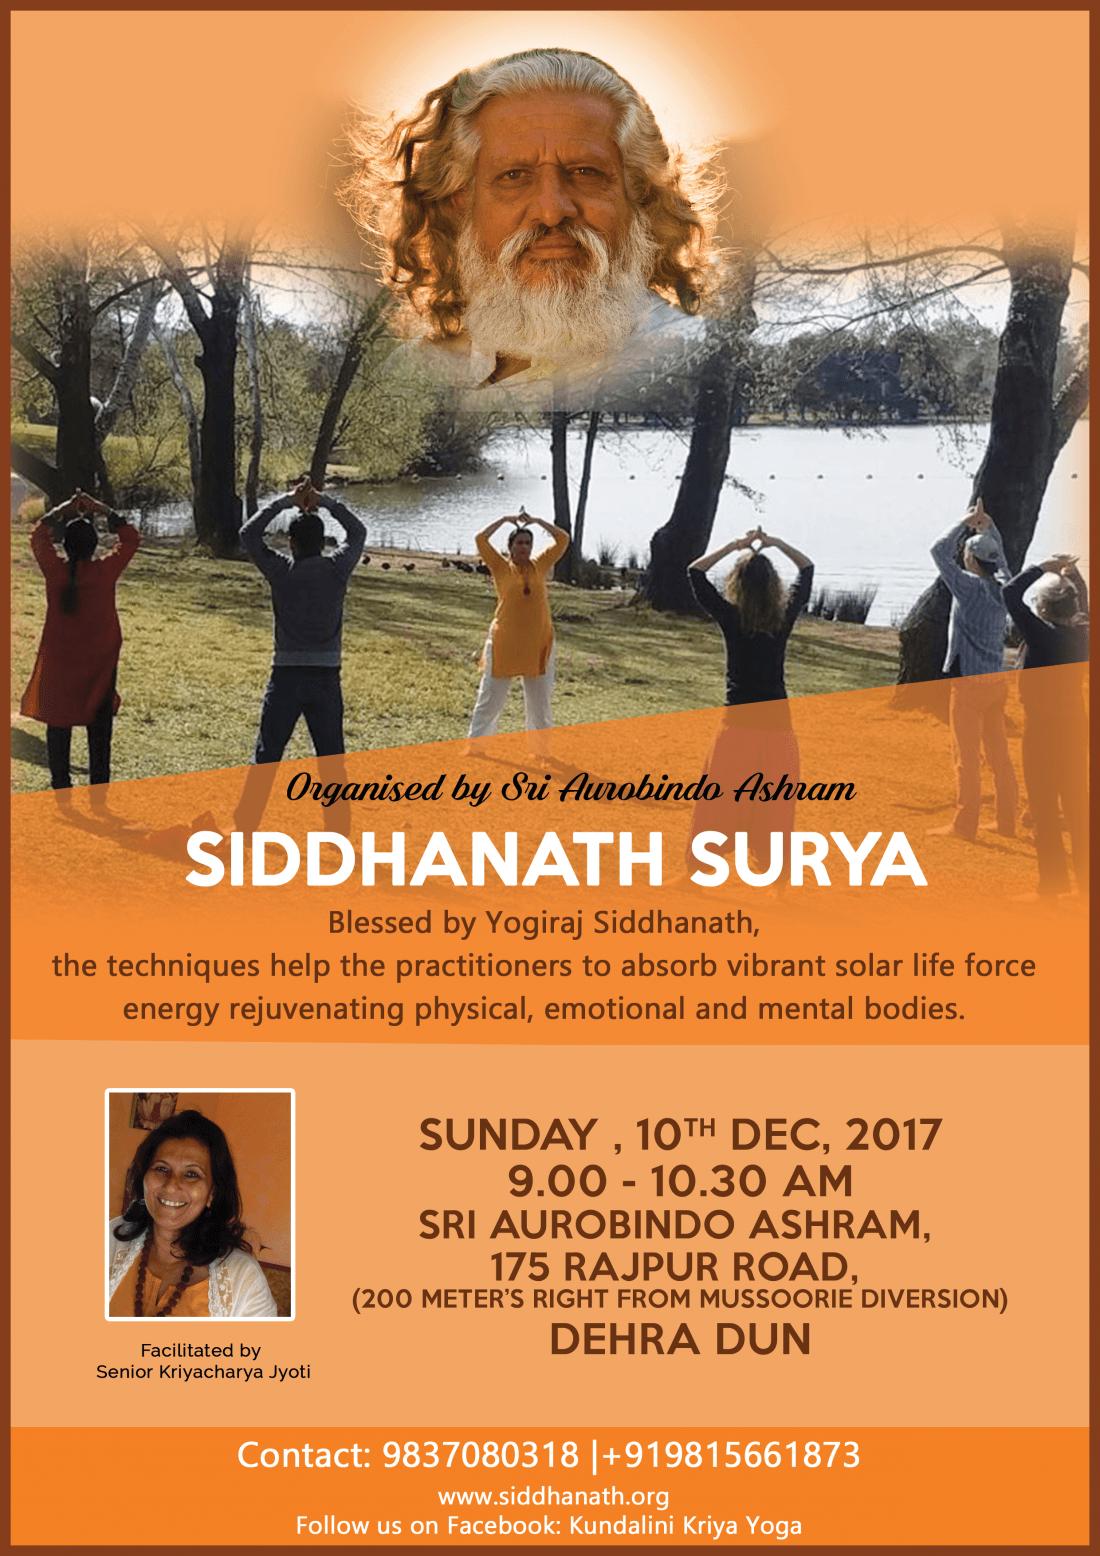 Siddhanath Surya